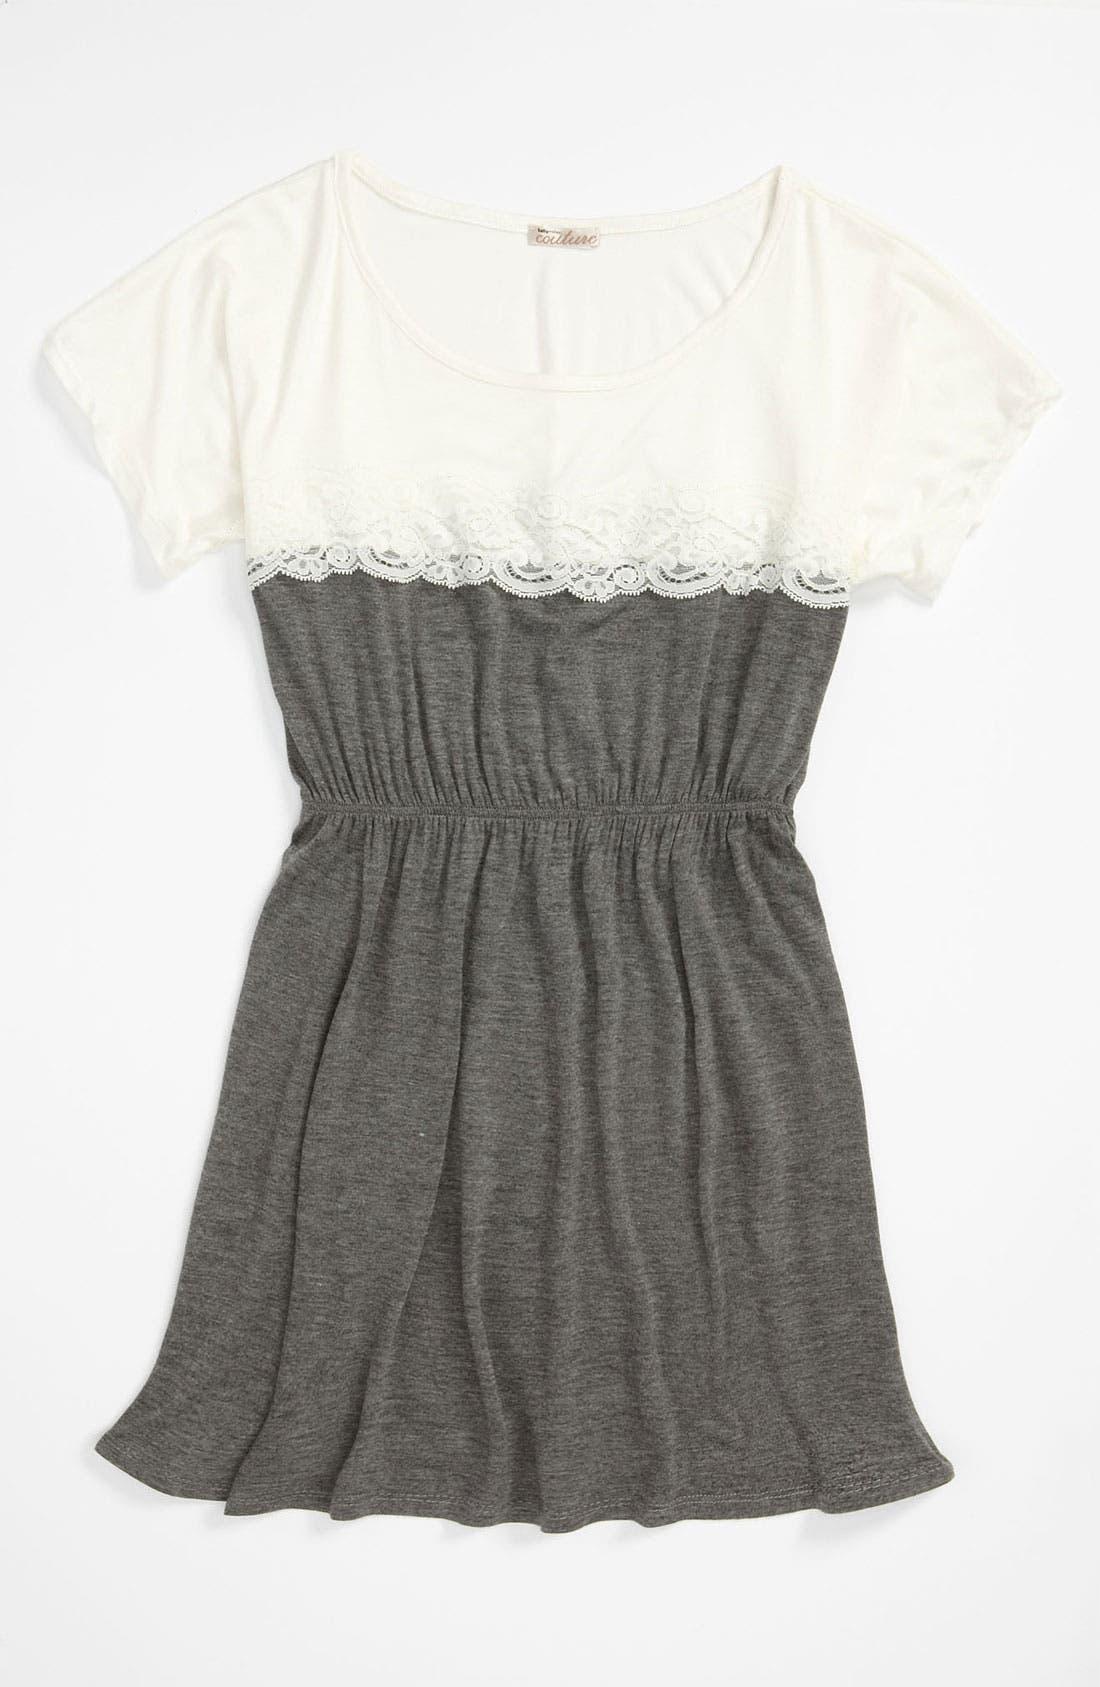 Main Image - Sally Miller Colorblock Lace Dress (Big Girls)